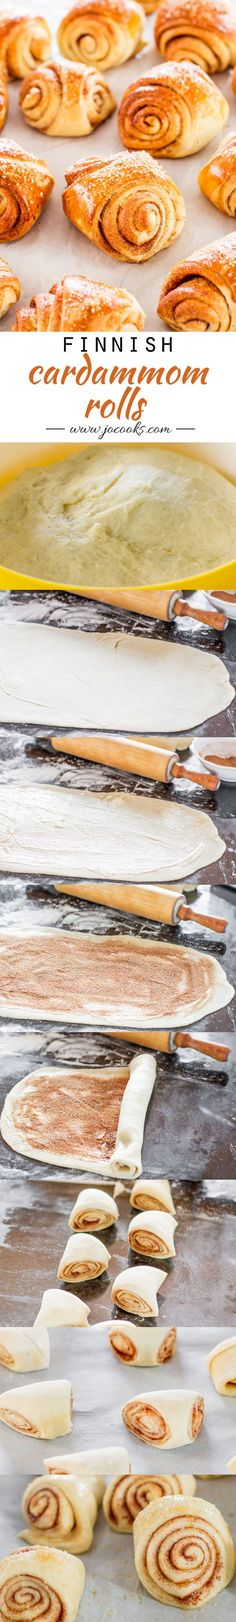 Finnish Cardamom Rolls